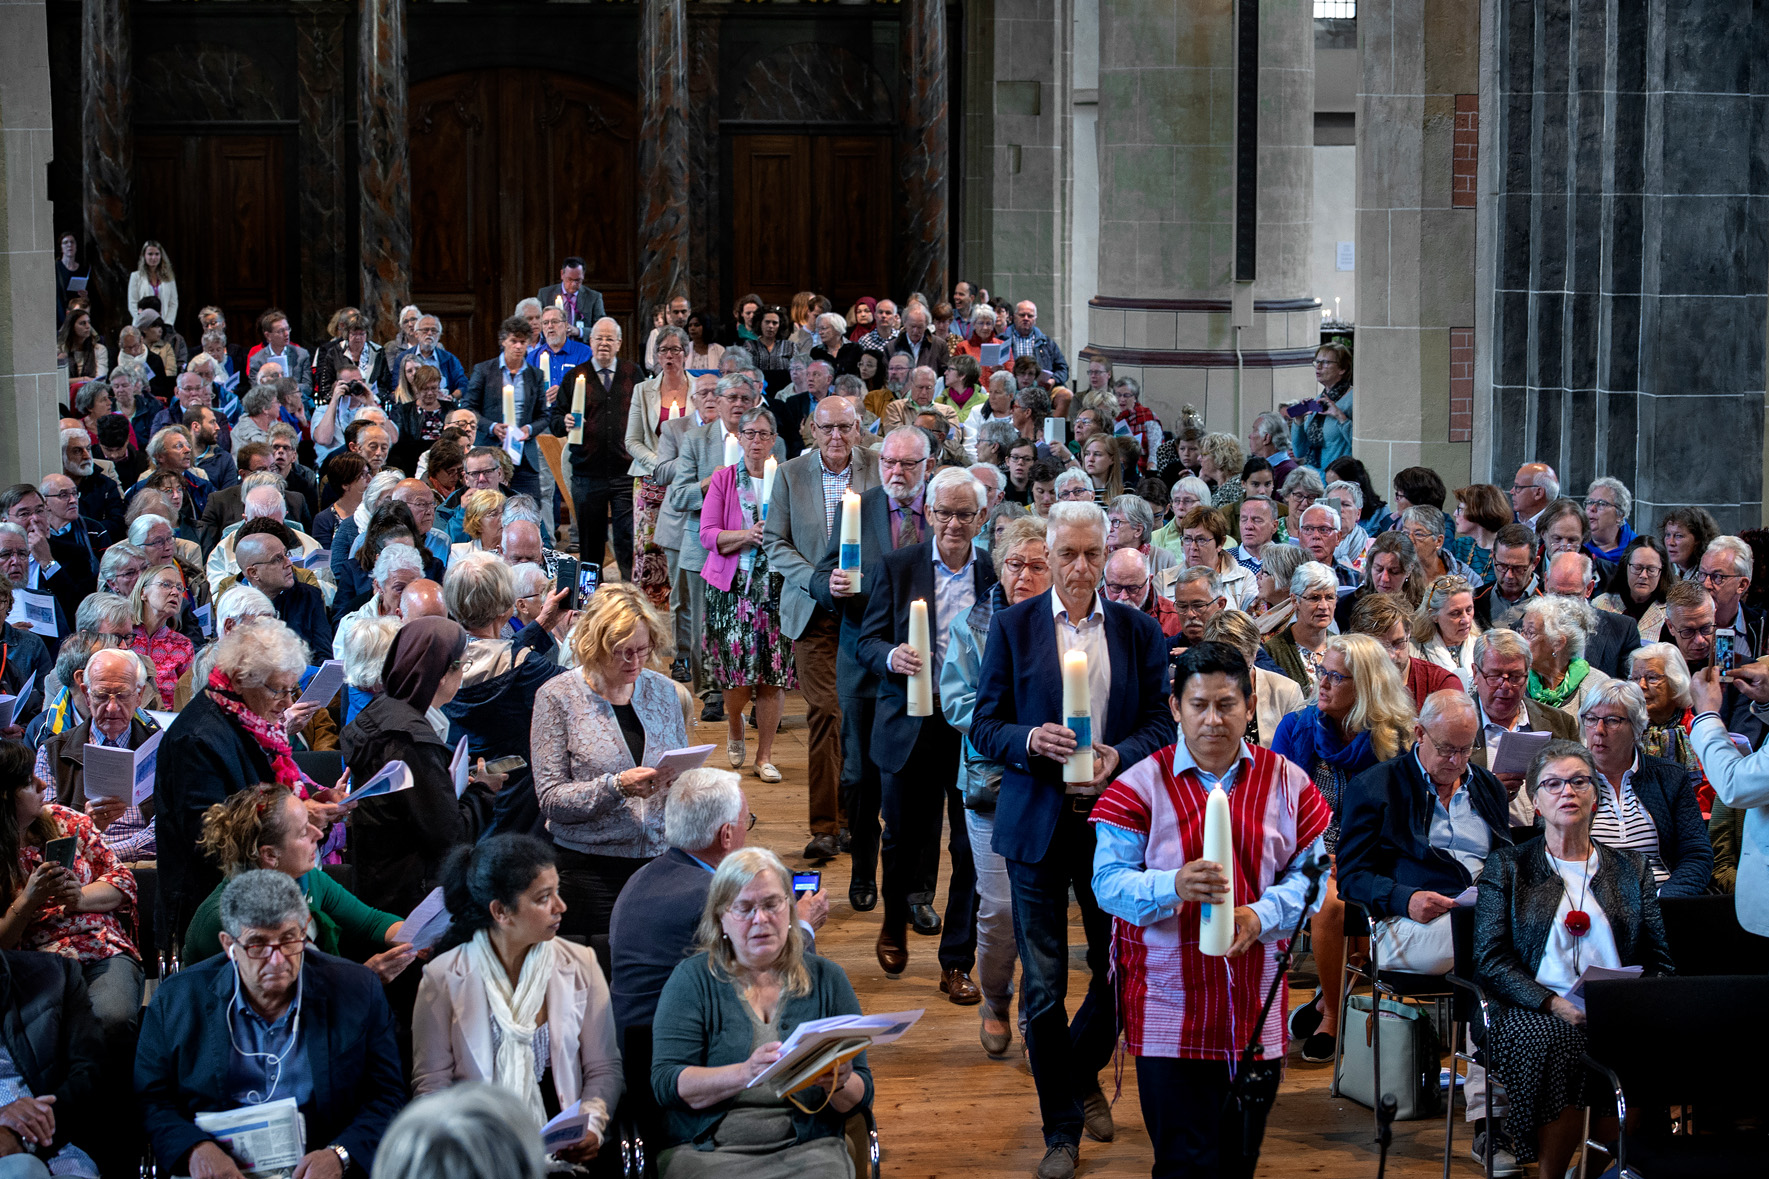 Martinikerk zondag 24 juni kaarsenprocessie